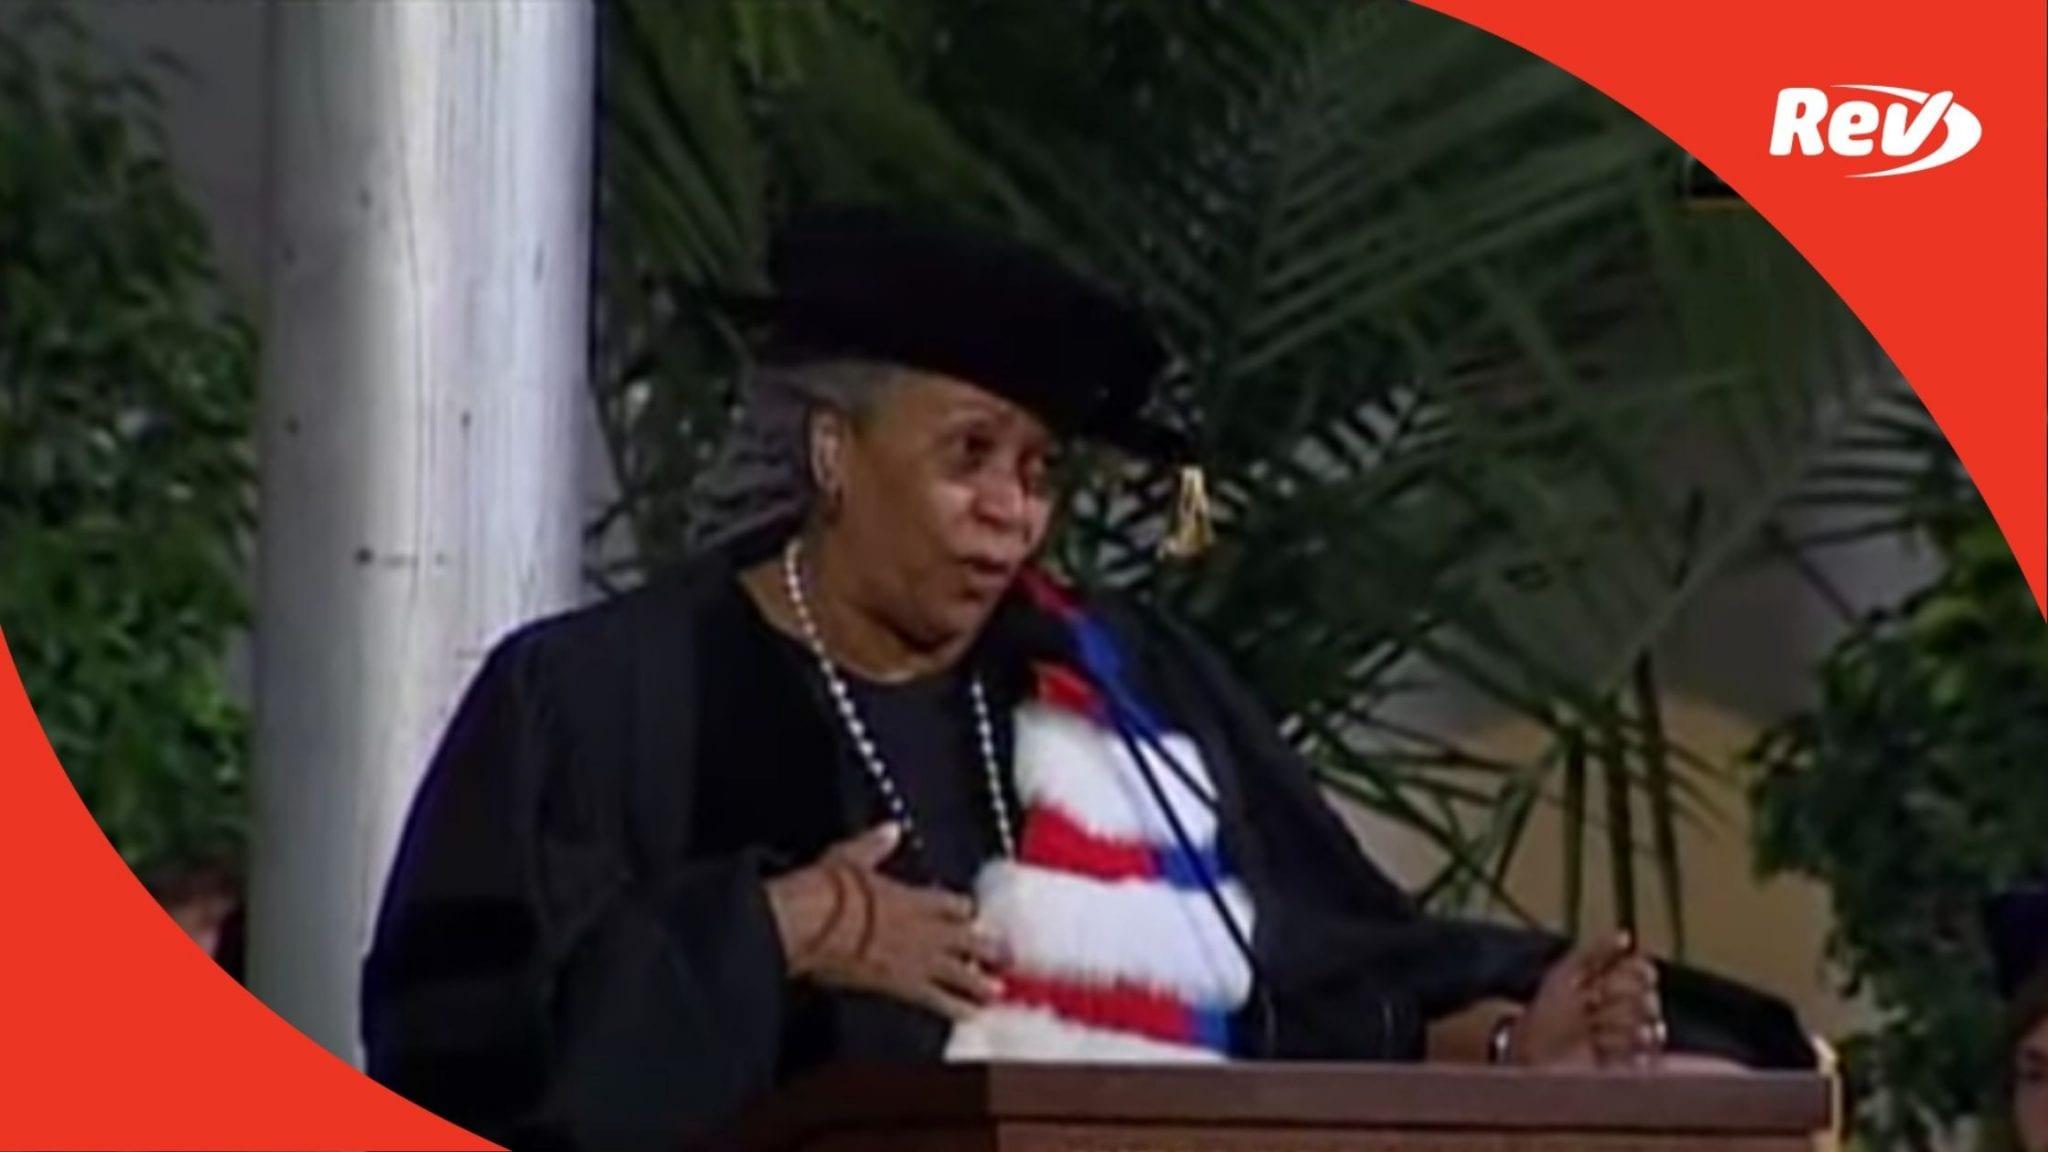 Toni Morrison 2004 Wellesley Commencement Address Speech Transcript